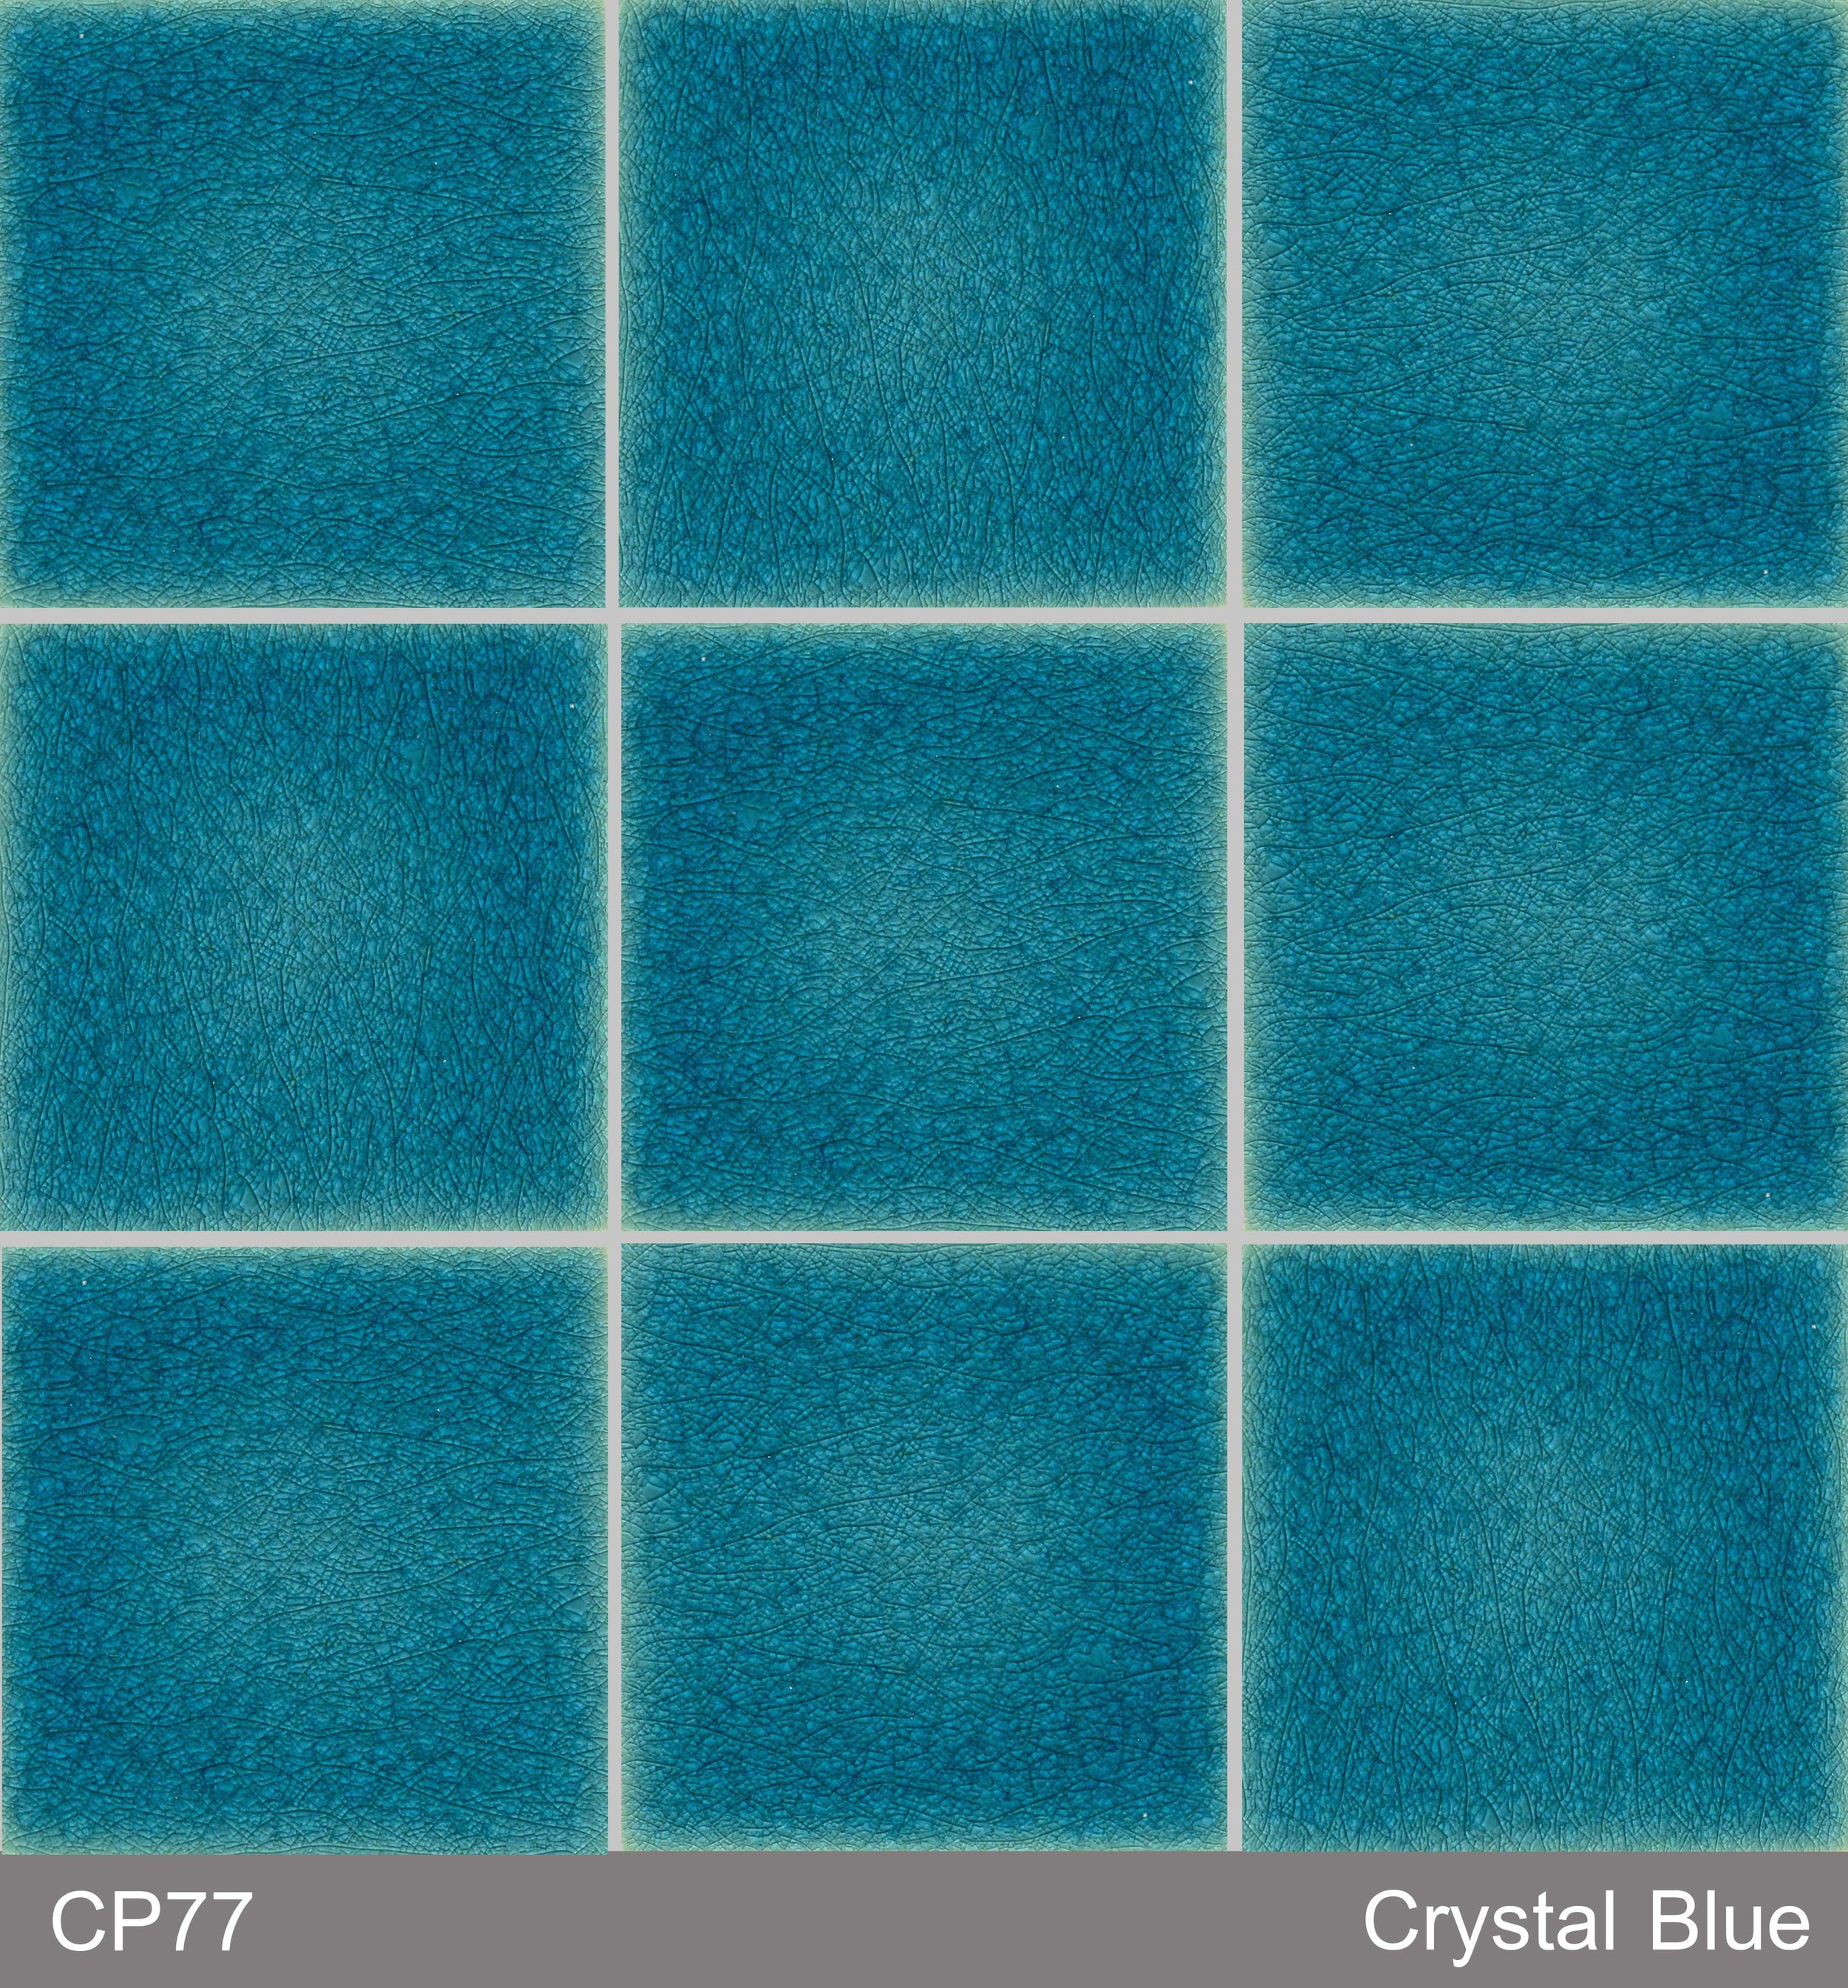 CP77 : Crystal blue